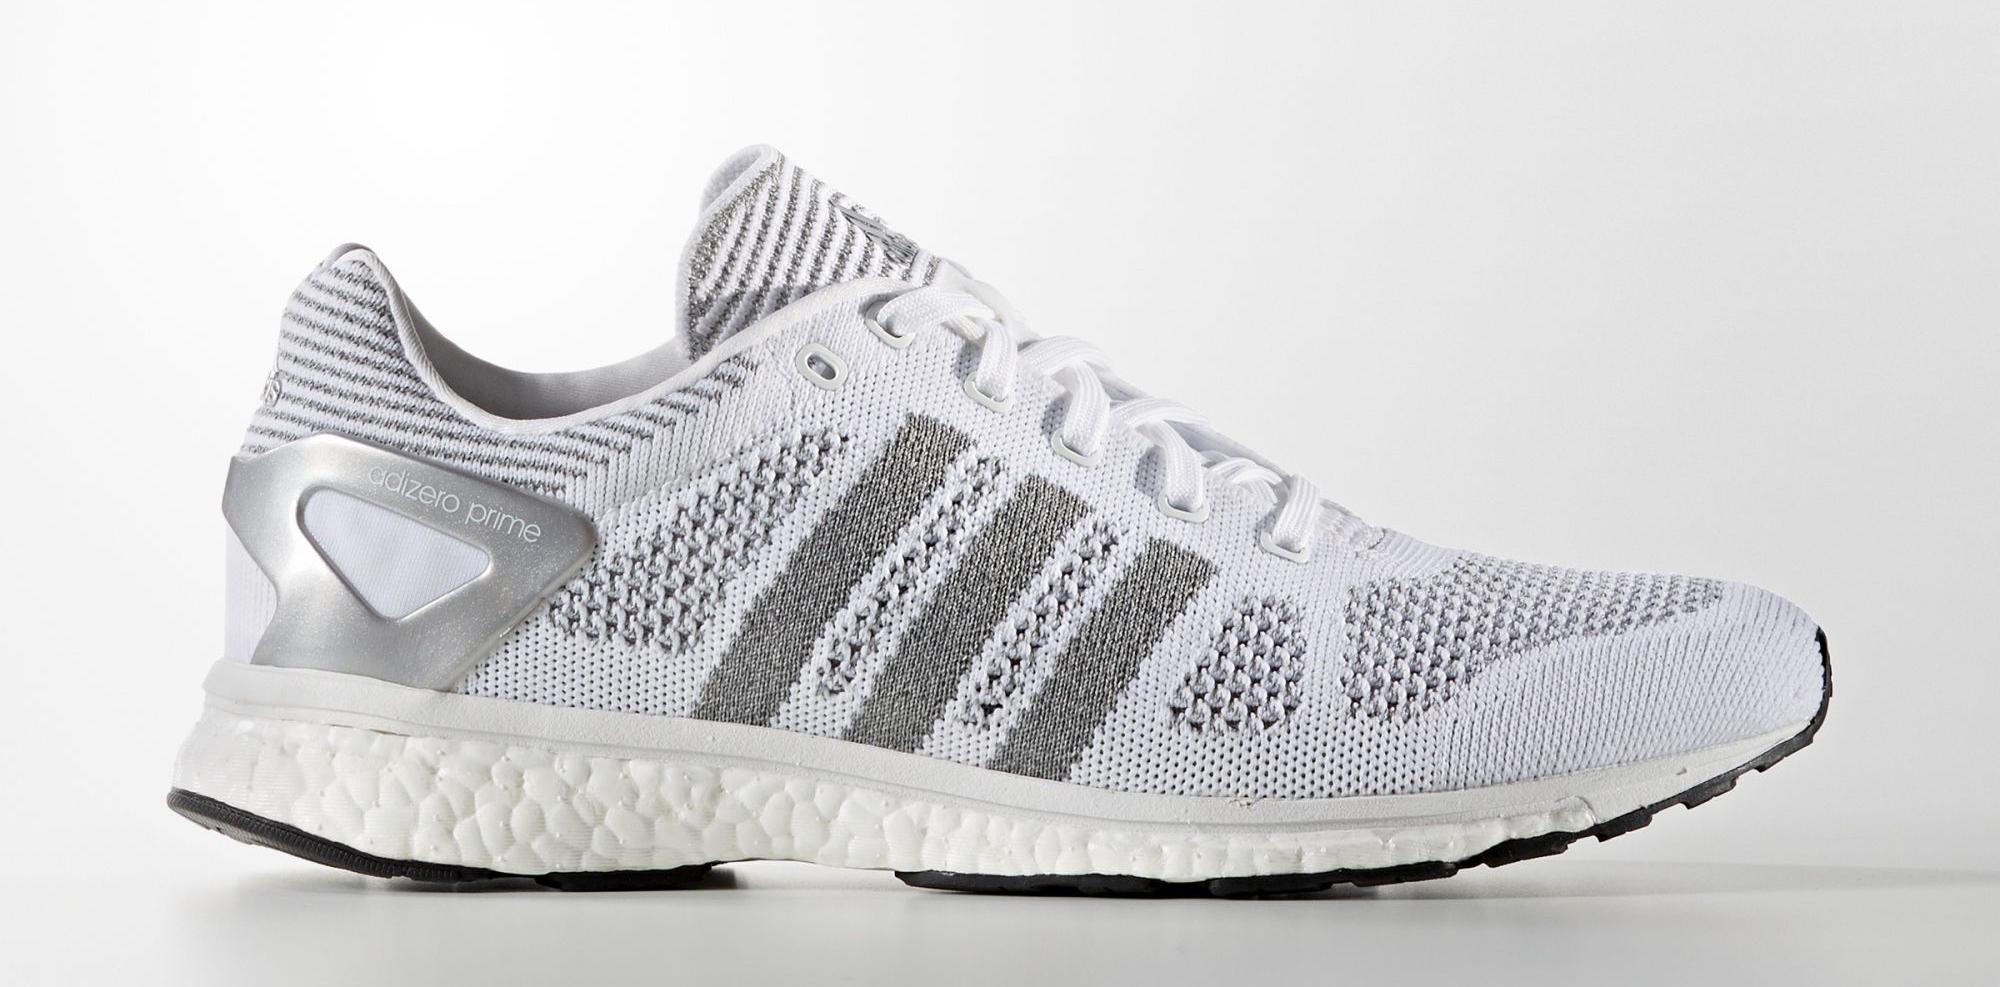 Adidas Adizero Primeknit White Reflective